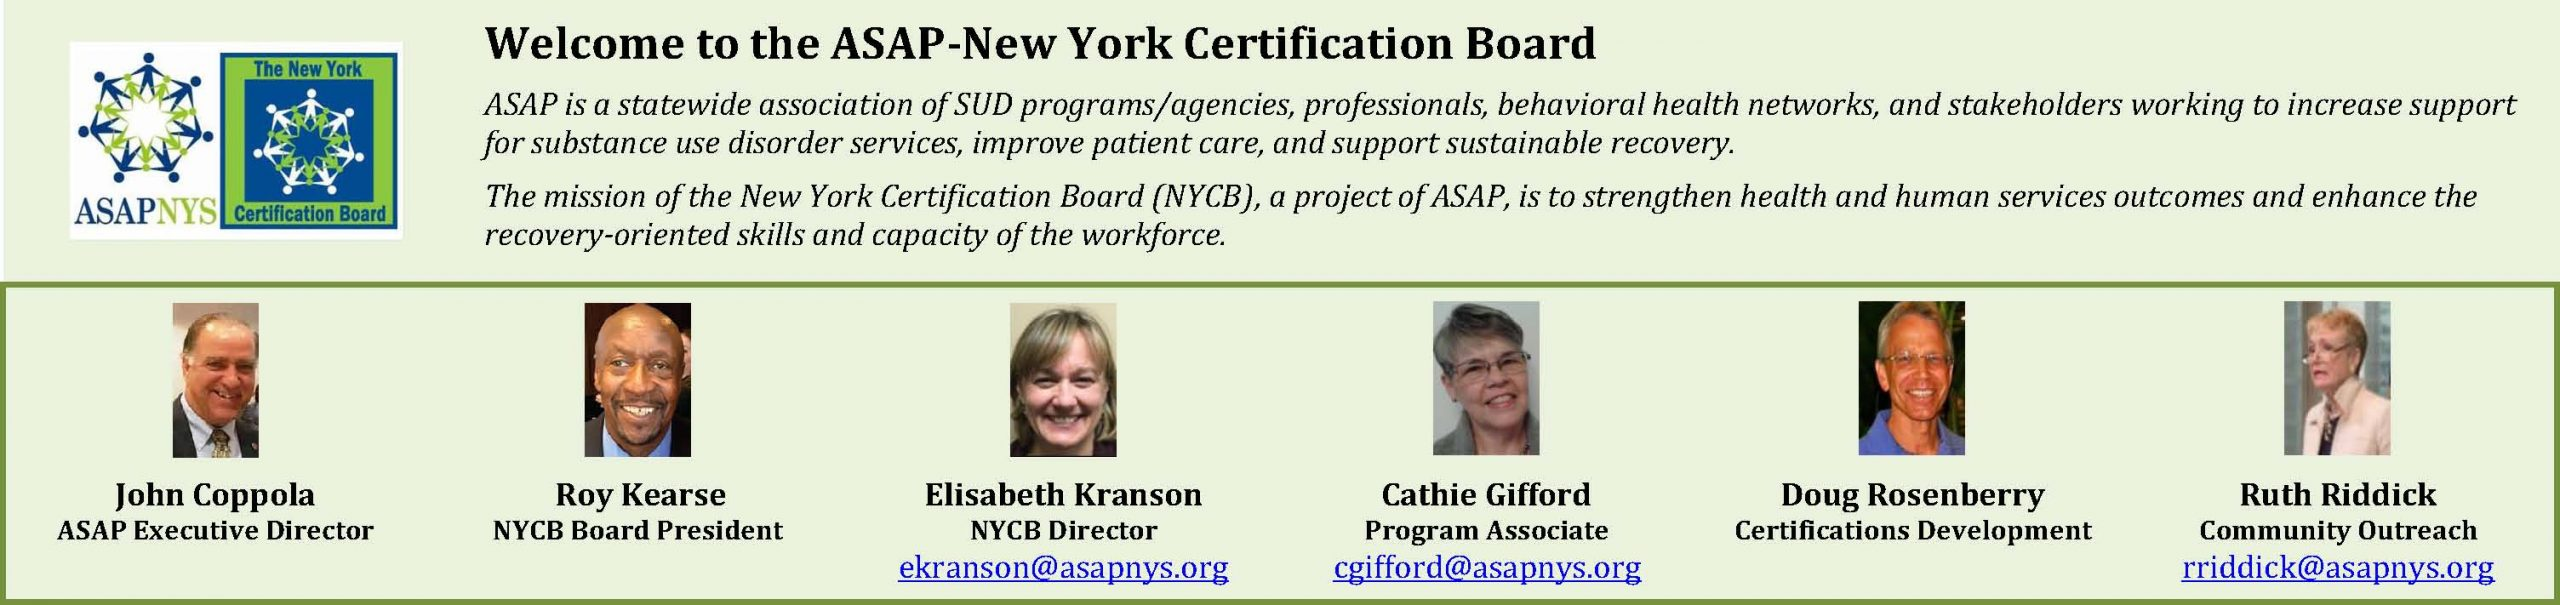 ASAP-NYCB.homepage-banner.9-29-2020